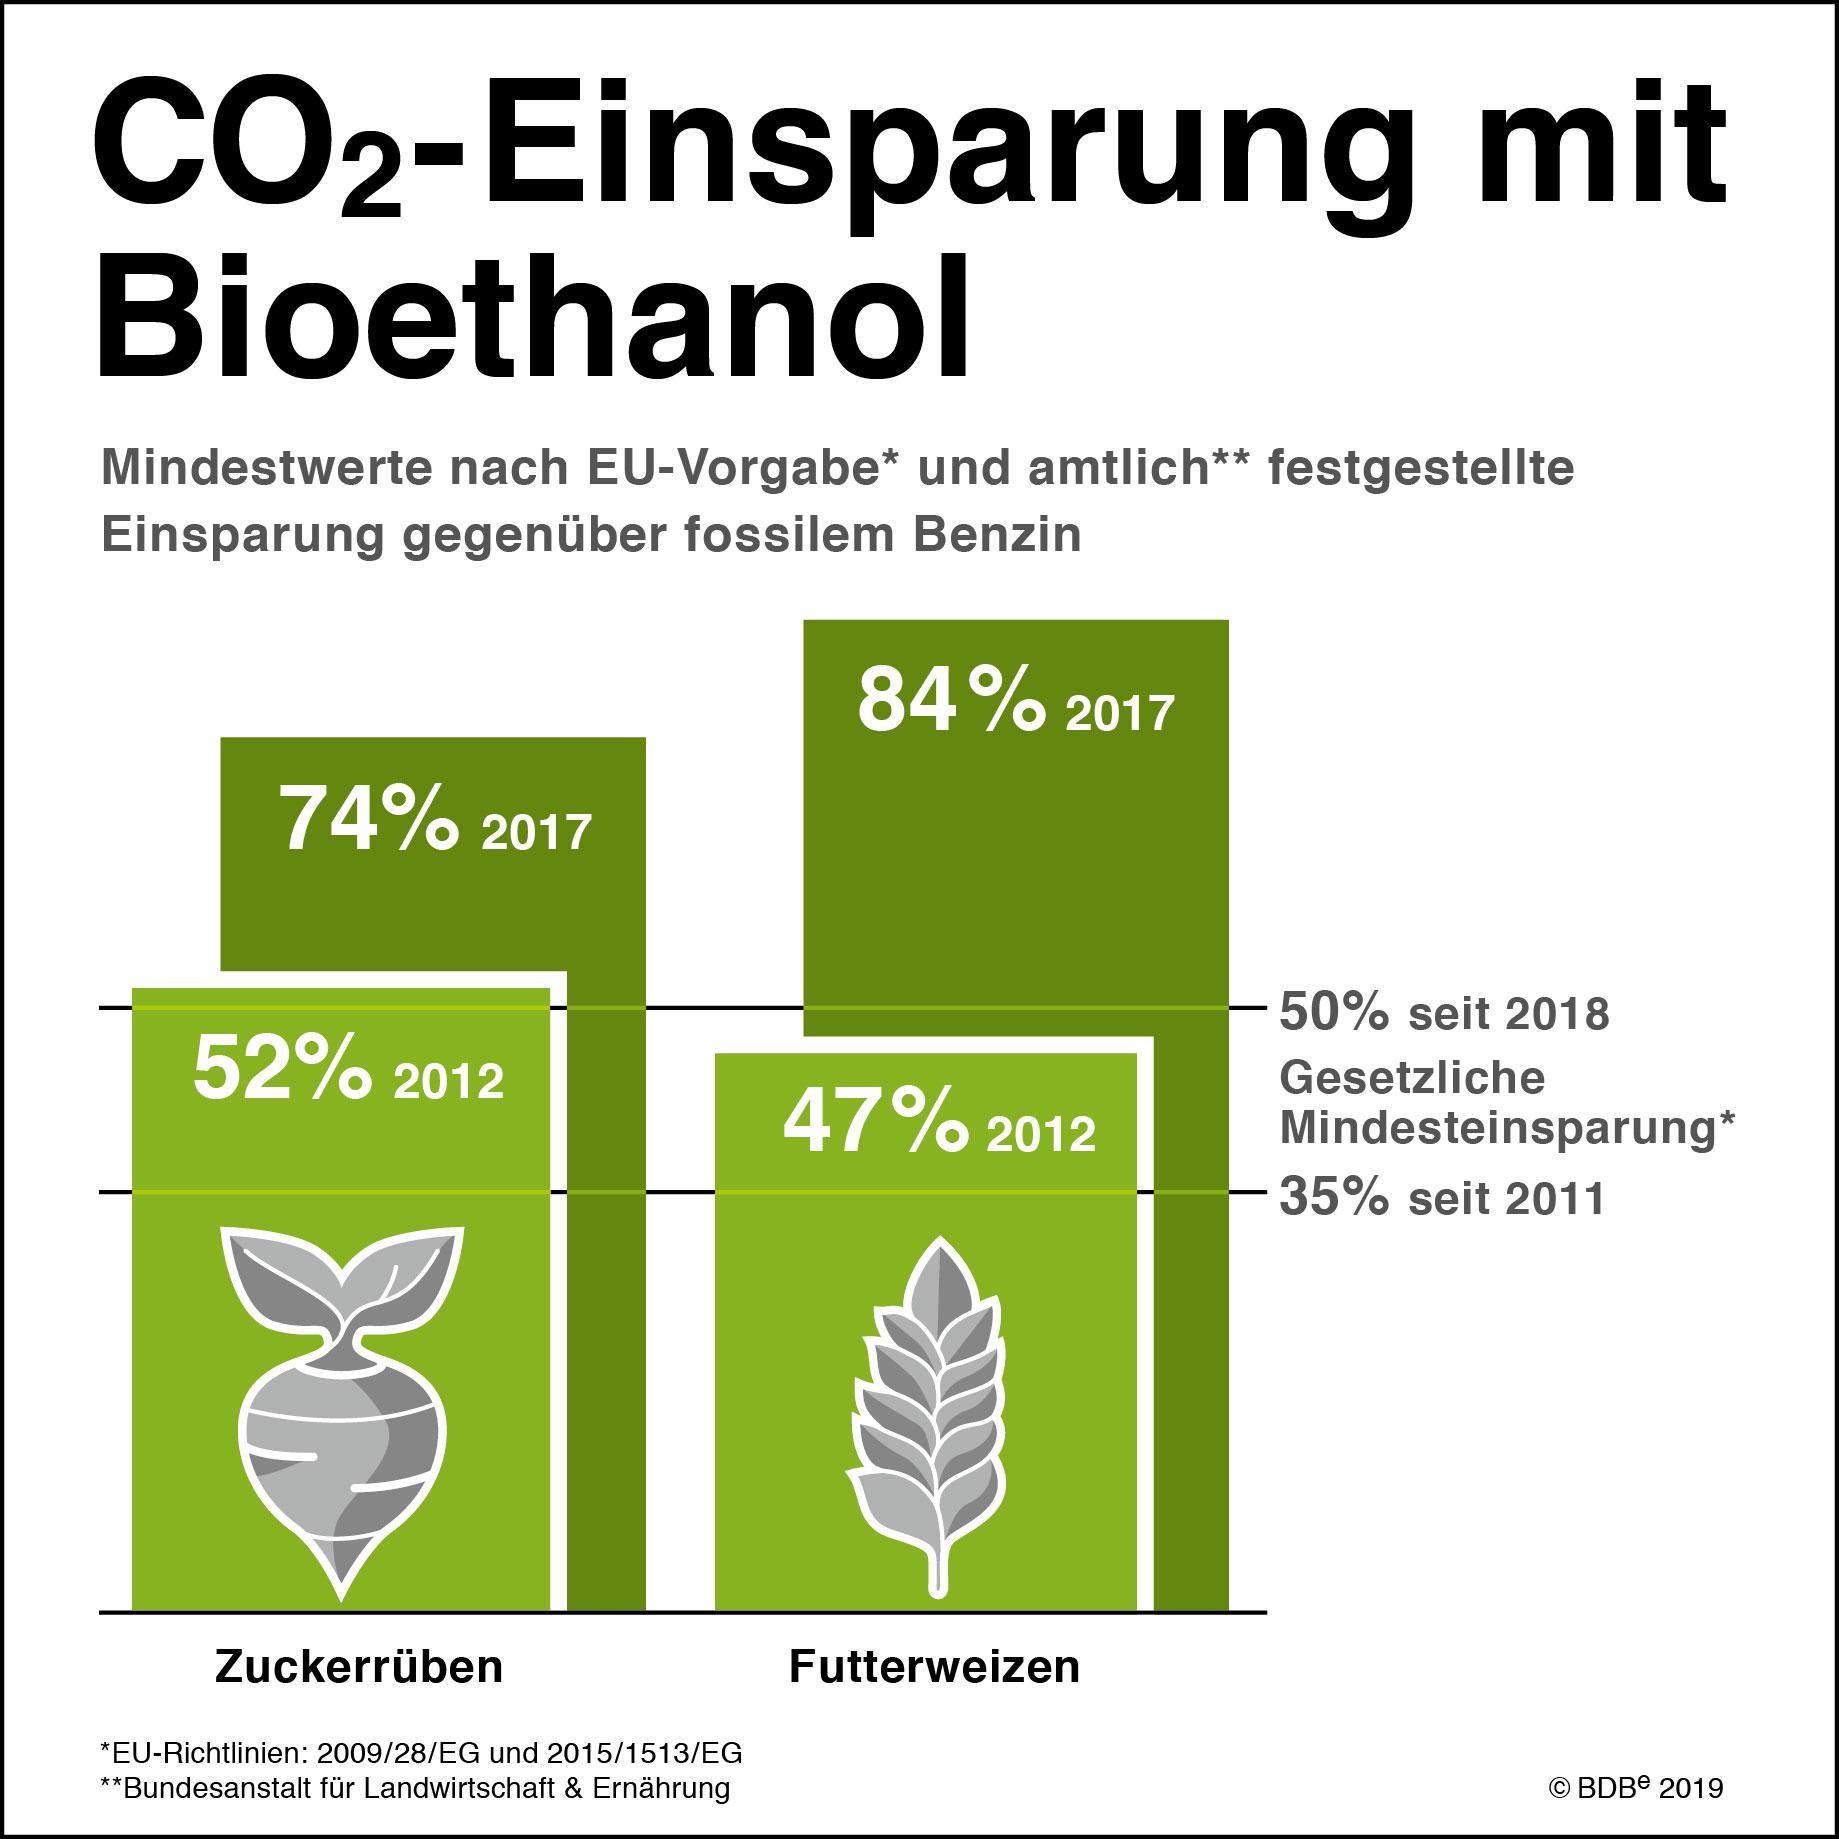 CO2-Einsparung_m._Bioethanol_12_2018_RZ.jpg